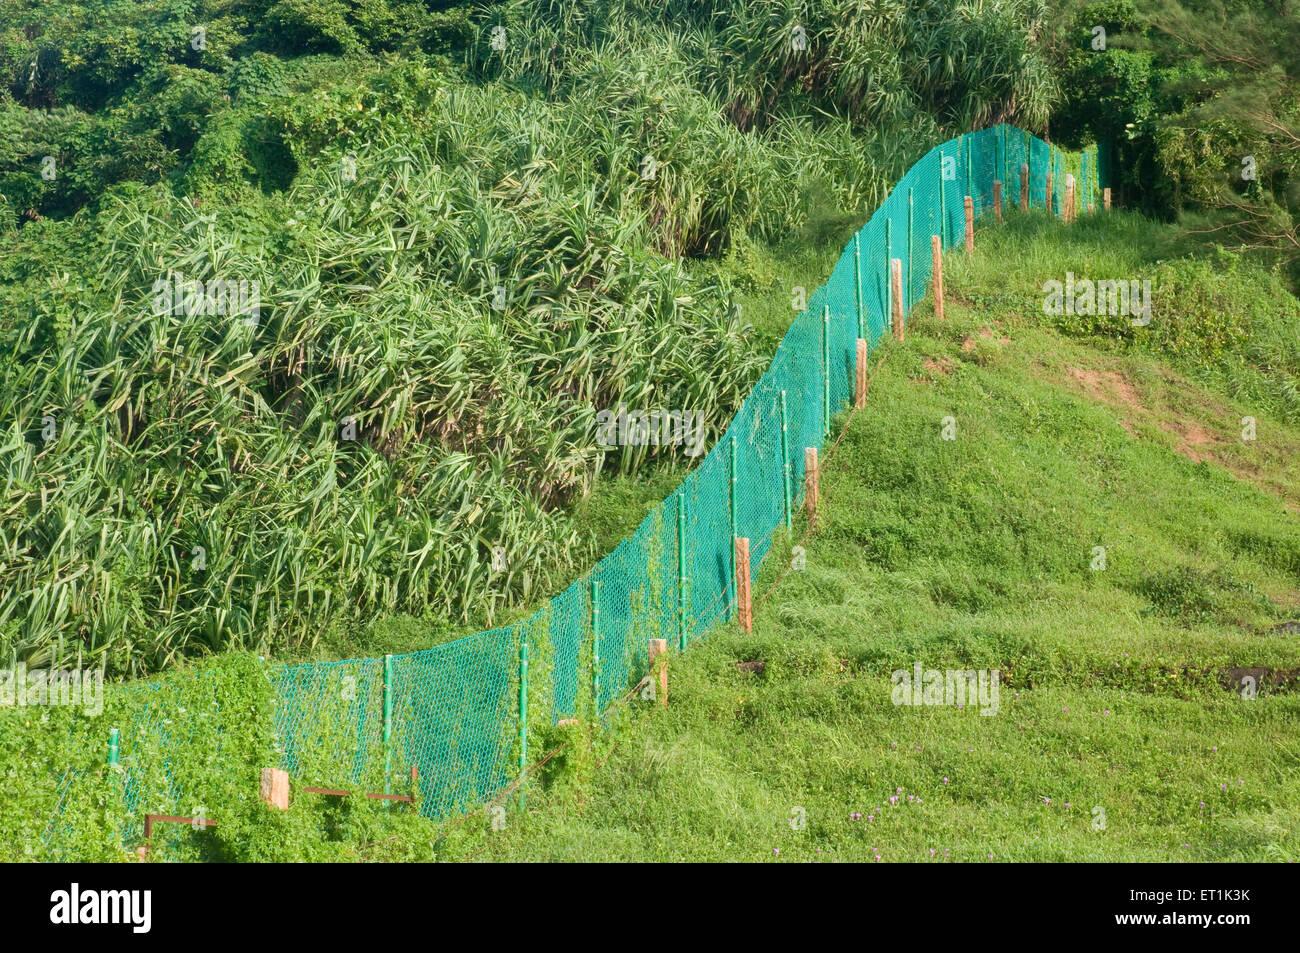 Laub und grünen Netz Teiler Anjuna Beach Goa Maharashtra Indien Asien Sept 2010 Stockbild